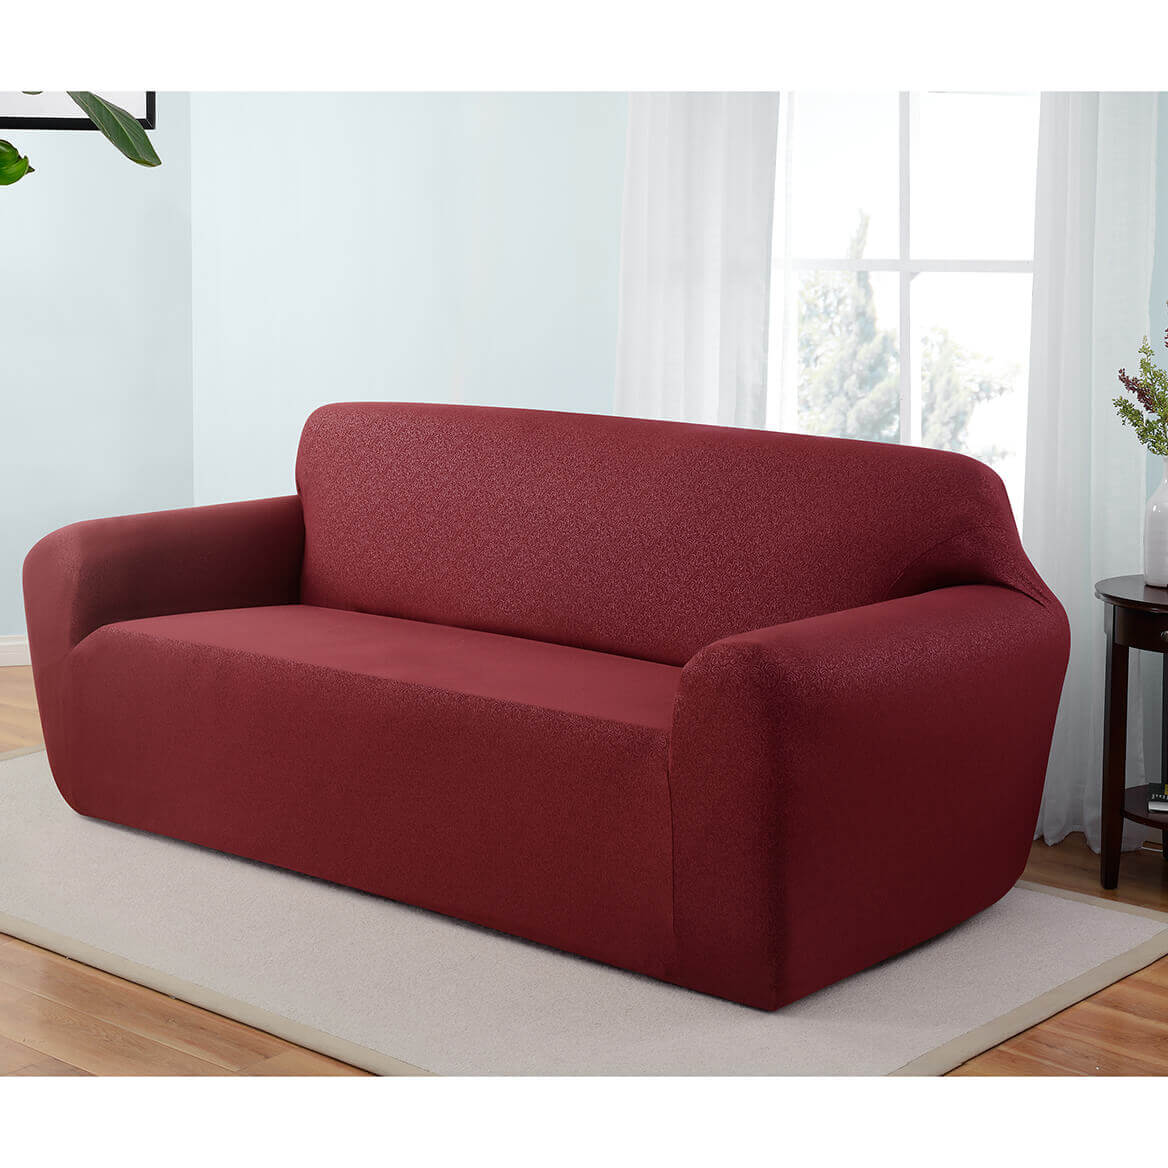 Kathy Ireland Ingenue Sofa Slipcover-362620